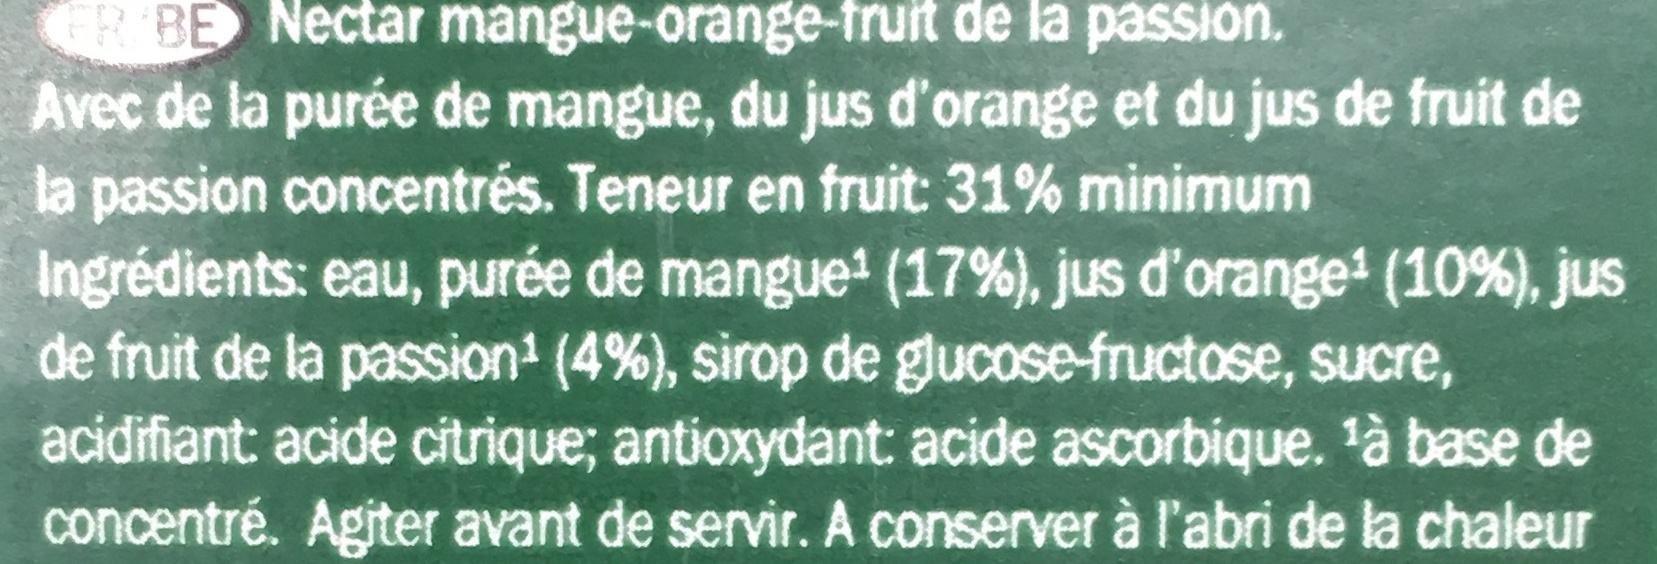 Nectar Mango- Passion Fruit - Ingredients